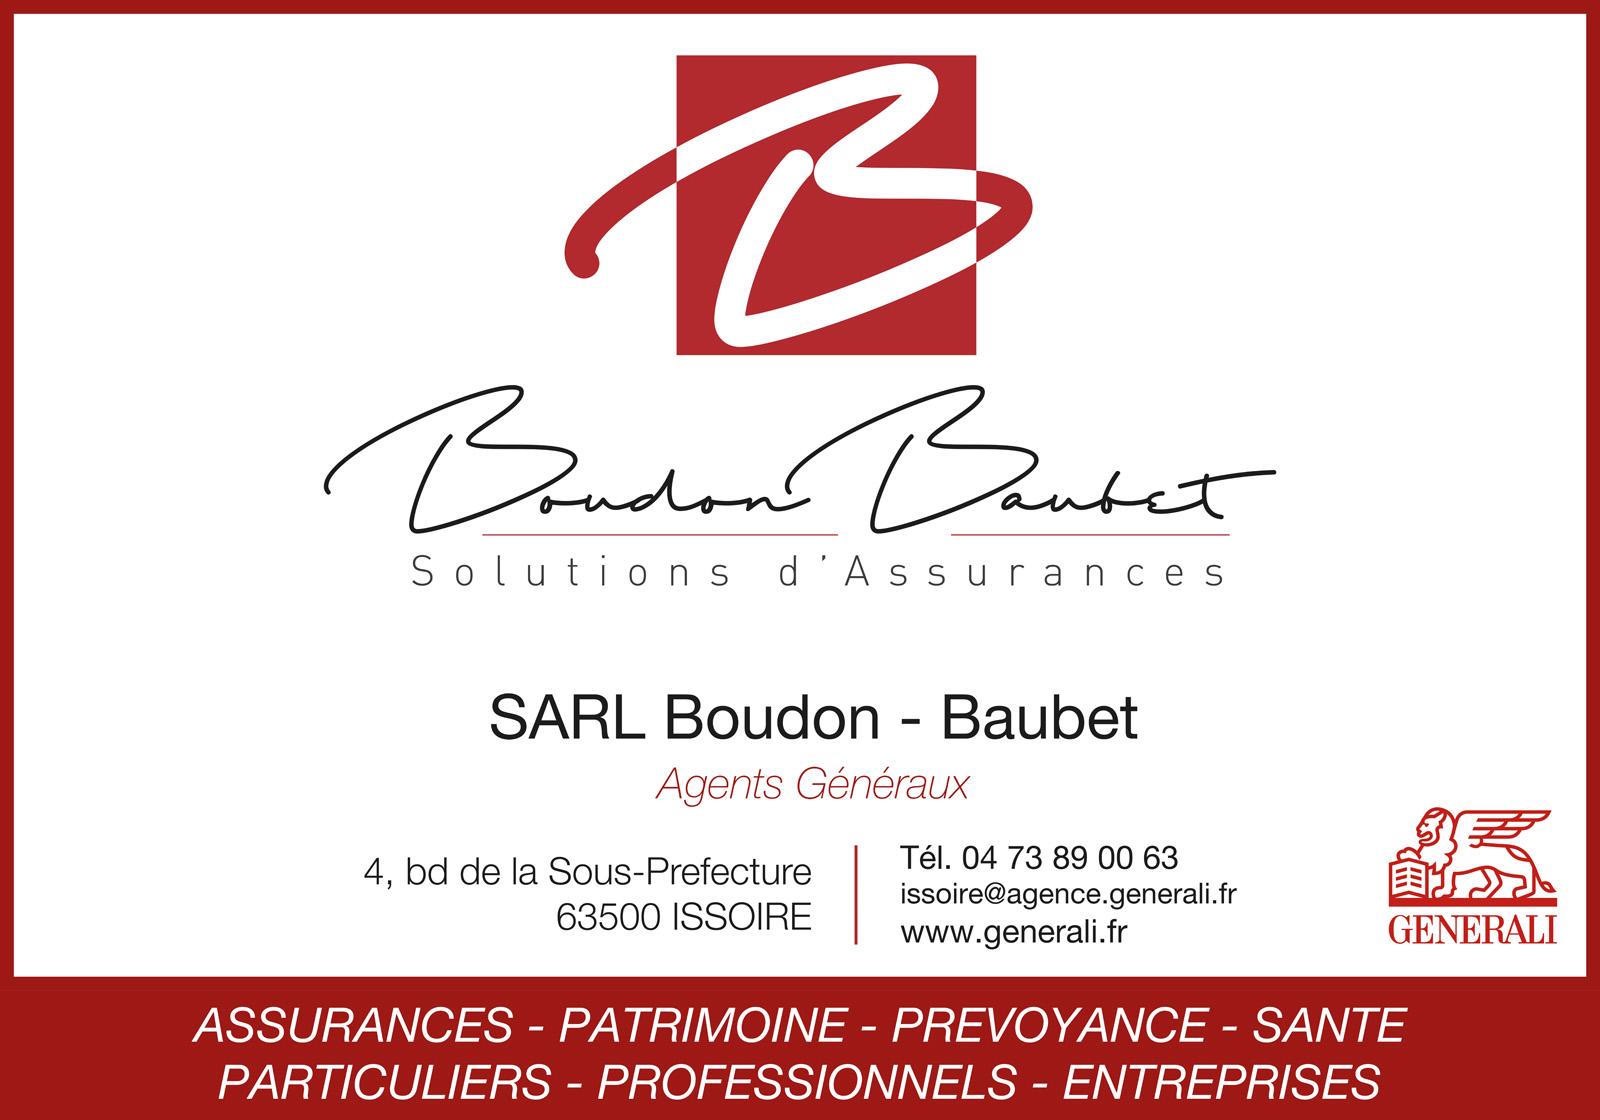 logo Générali - Boudon-Baubet